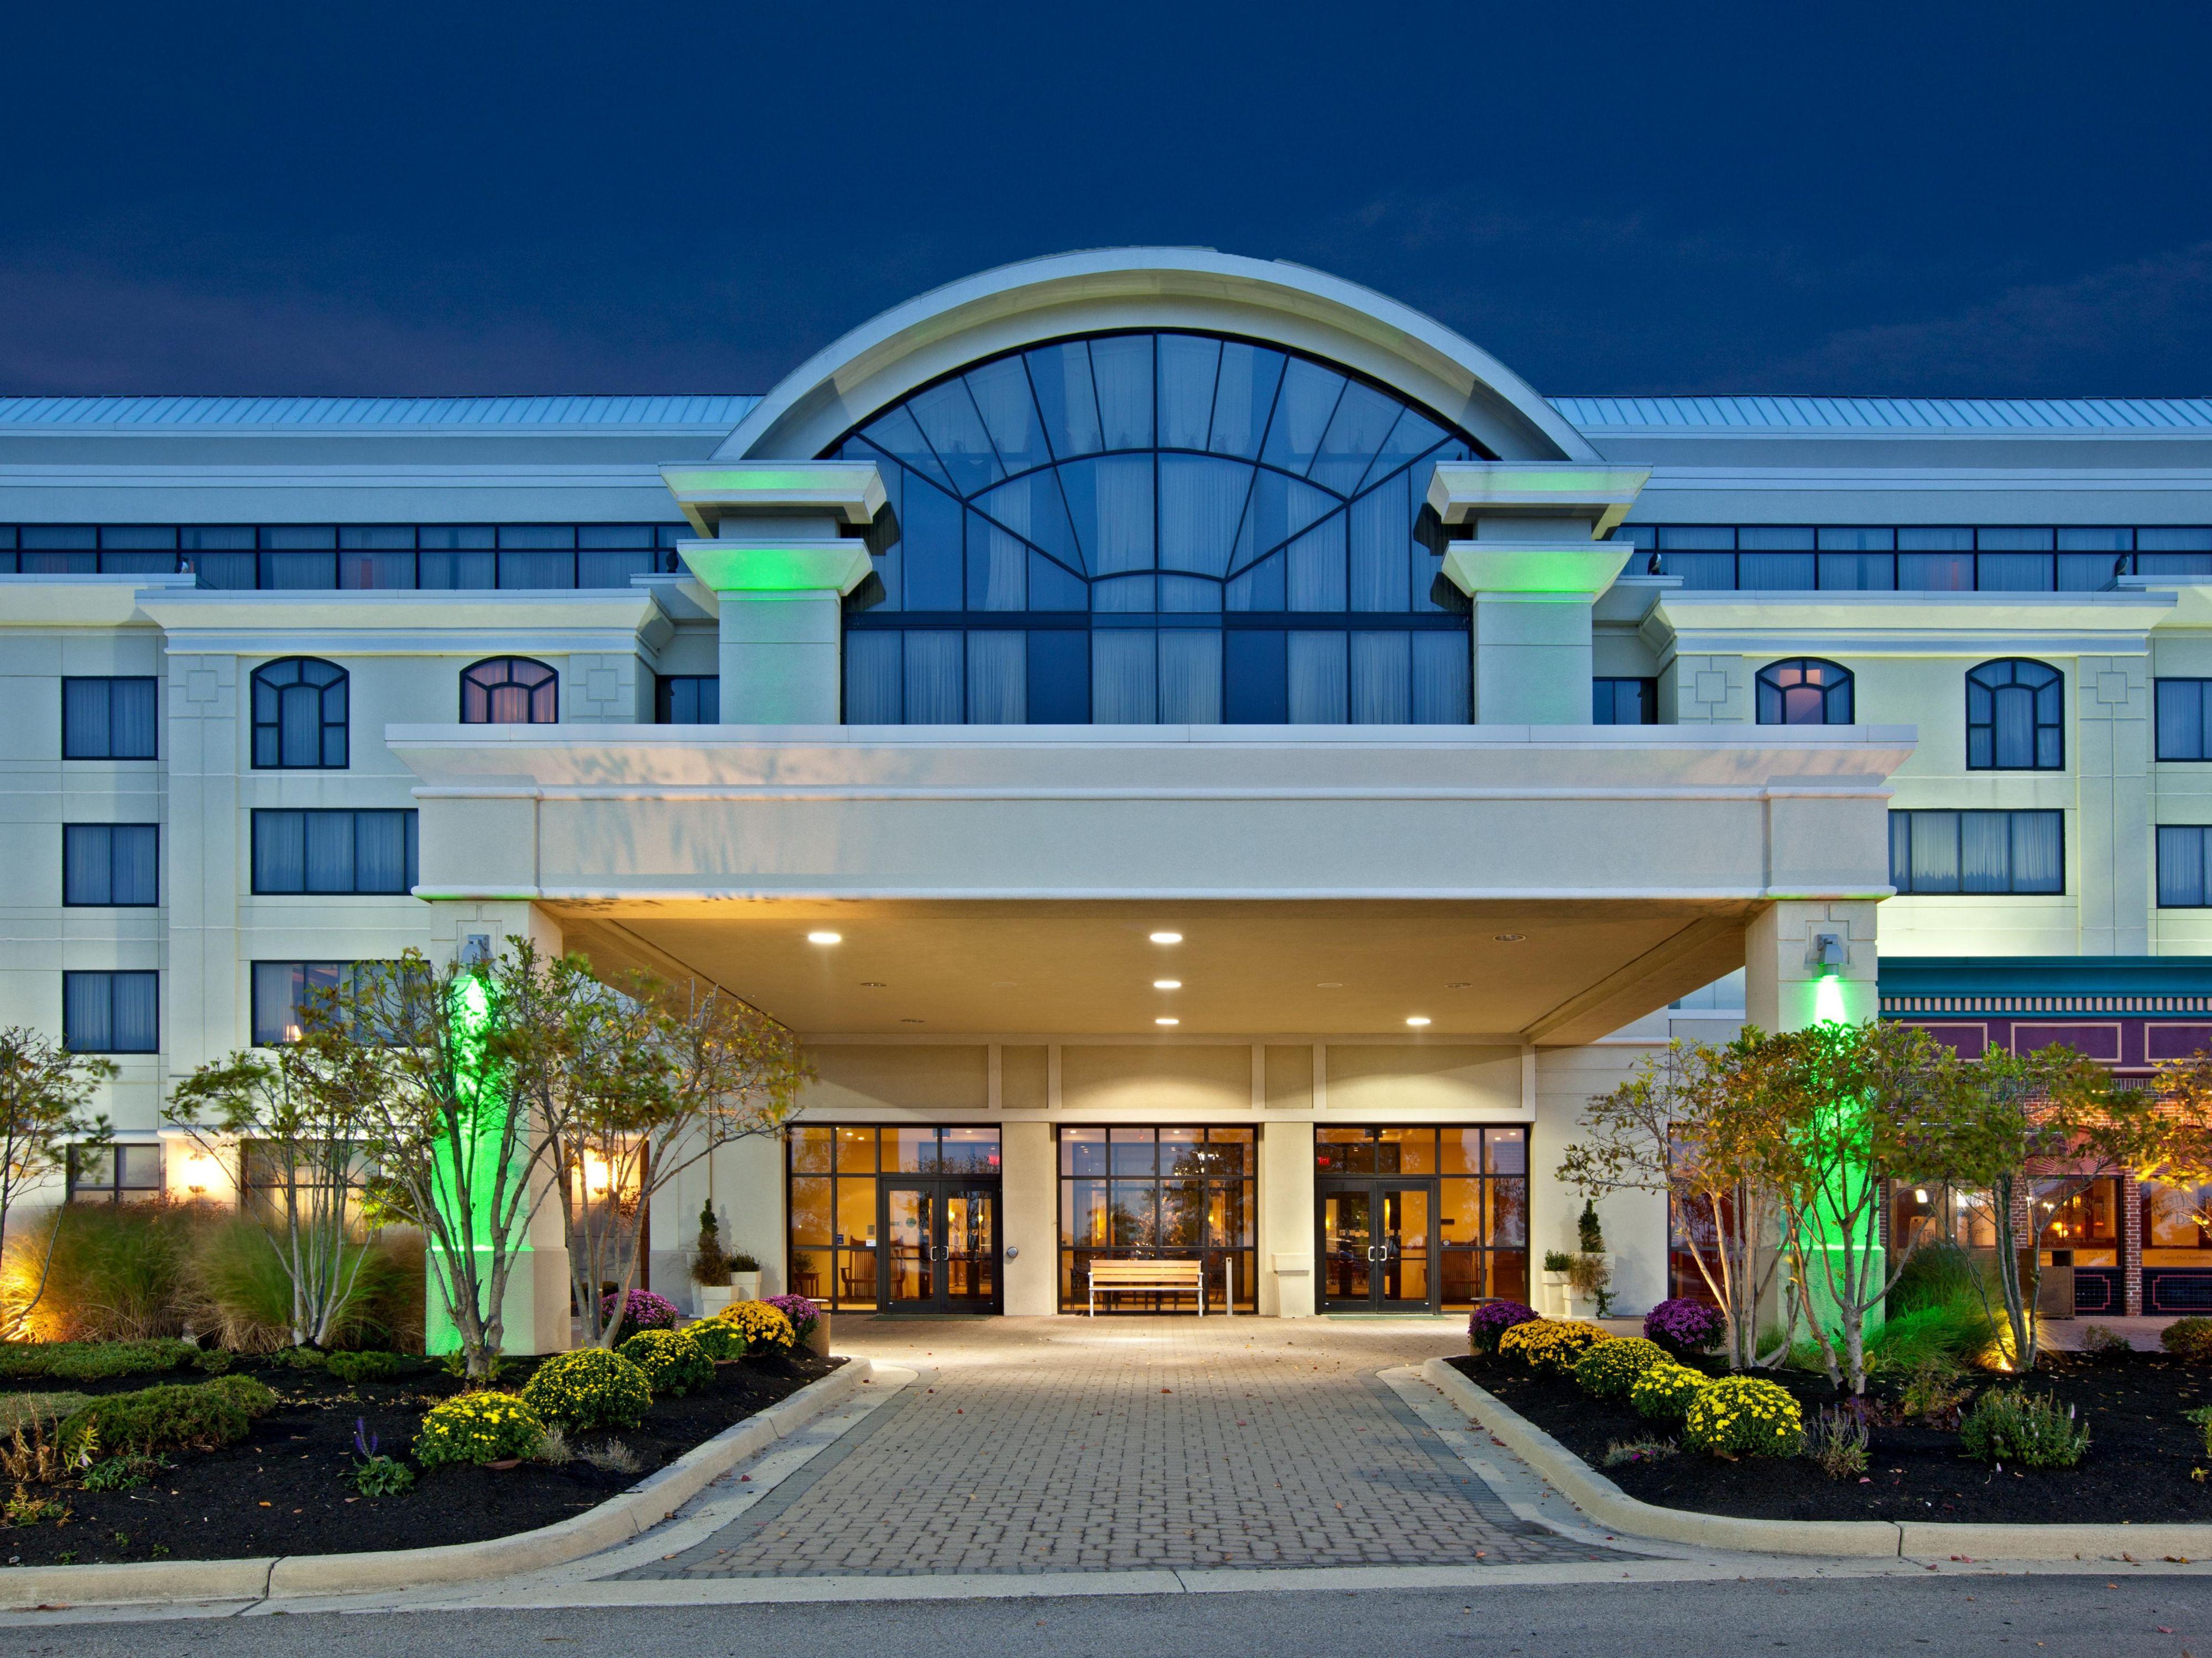 Find dayton hotels top 13 hotels in dayton oh by ihg